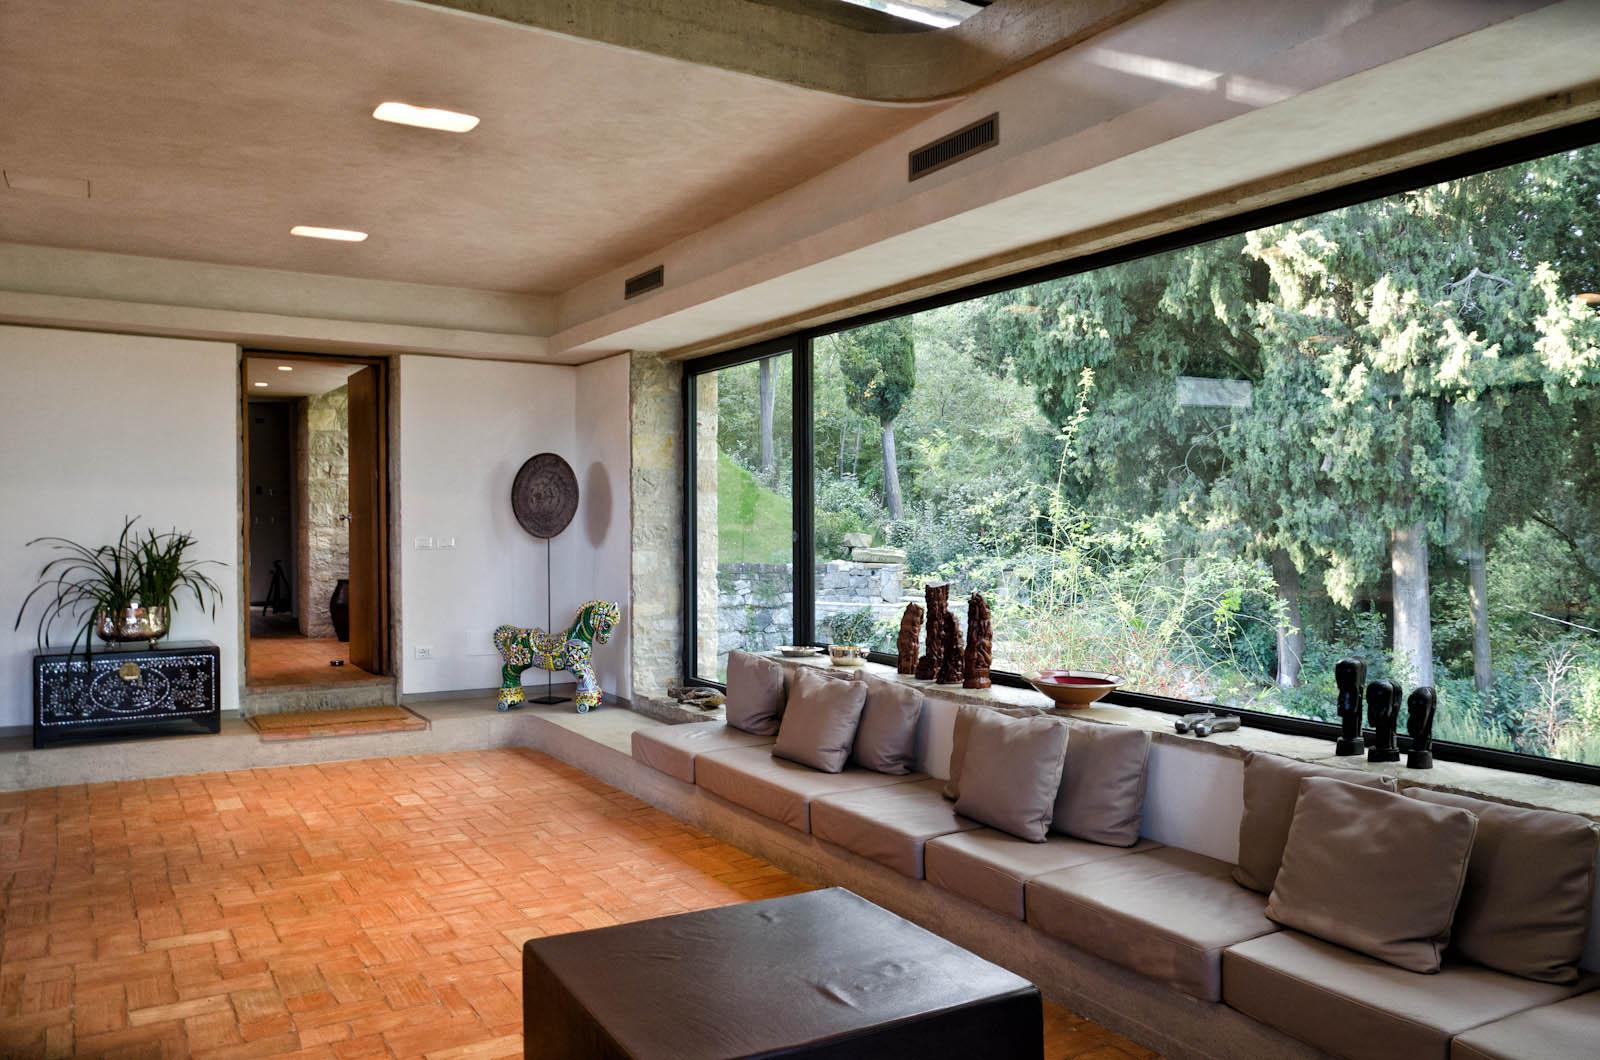 Villa waddell a fiesole for Casa moderna vetrate